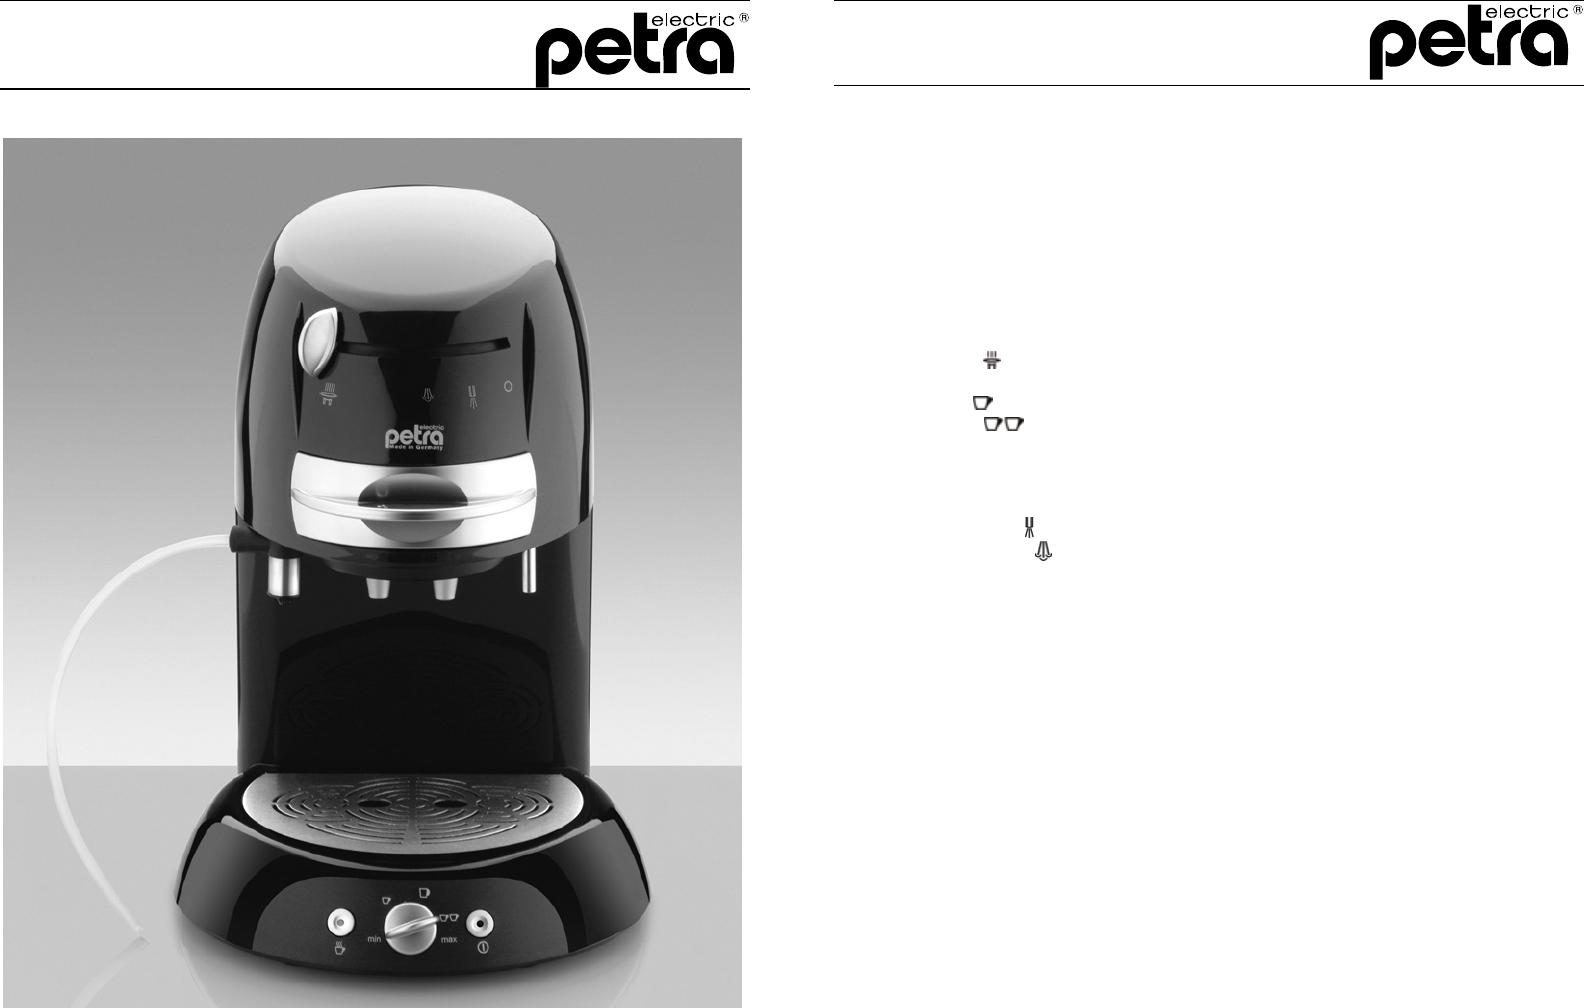 petra kaffeemaschine entkalken video petra kaffeepadmaschine entkalken petra kaffeepadmaschine. Black Bedroom Furniture Sets. Home Design Ideas